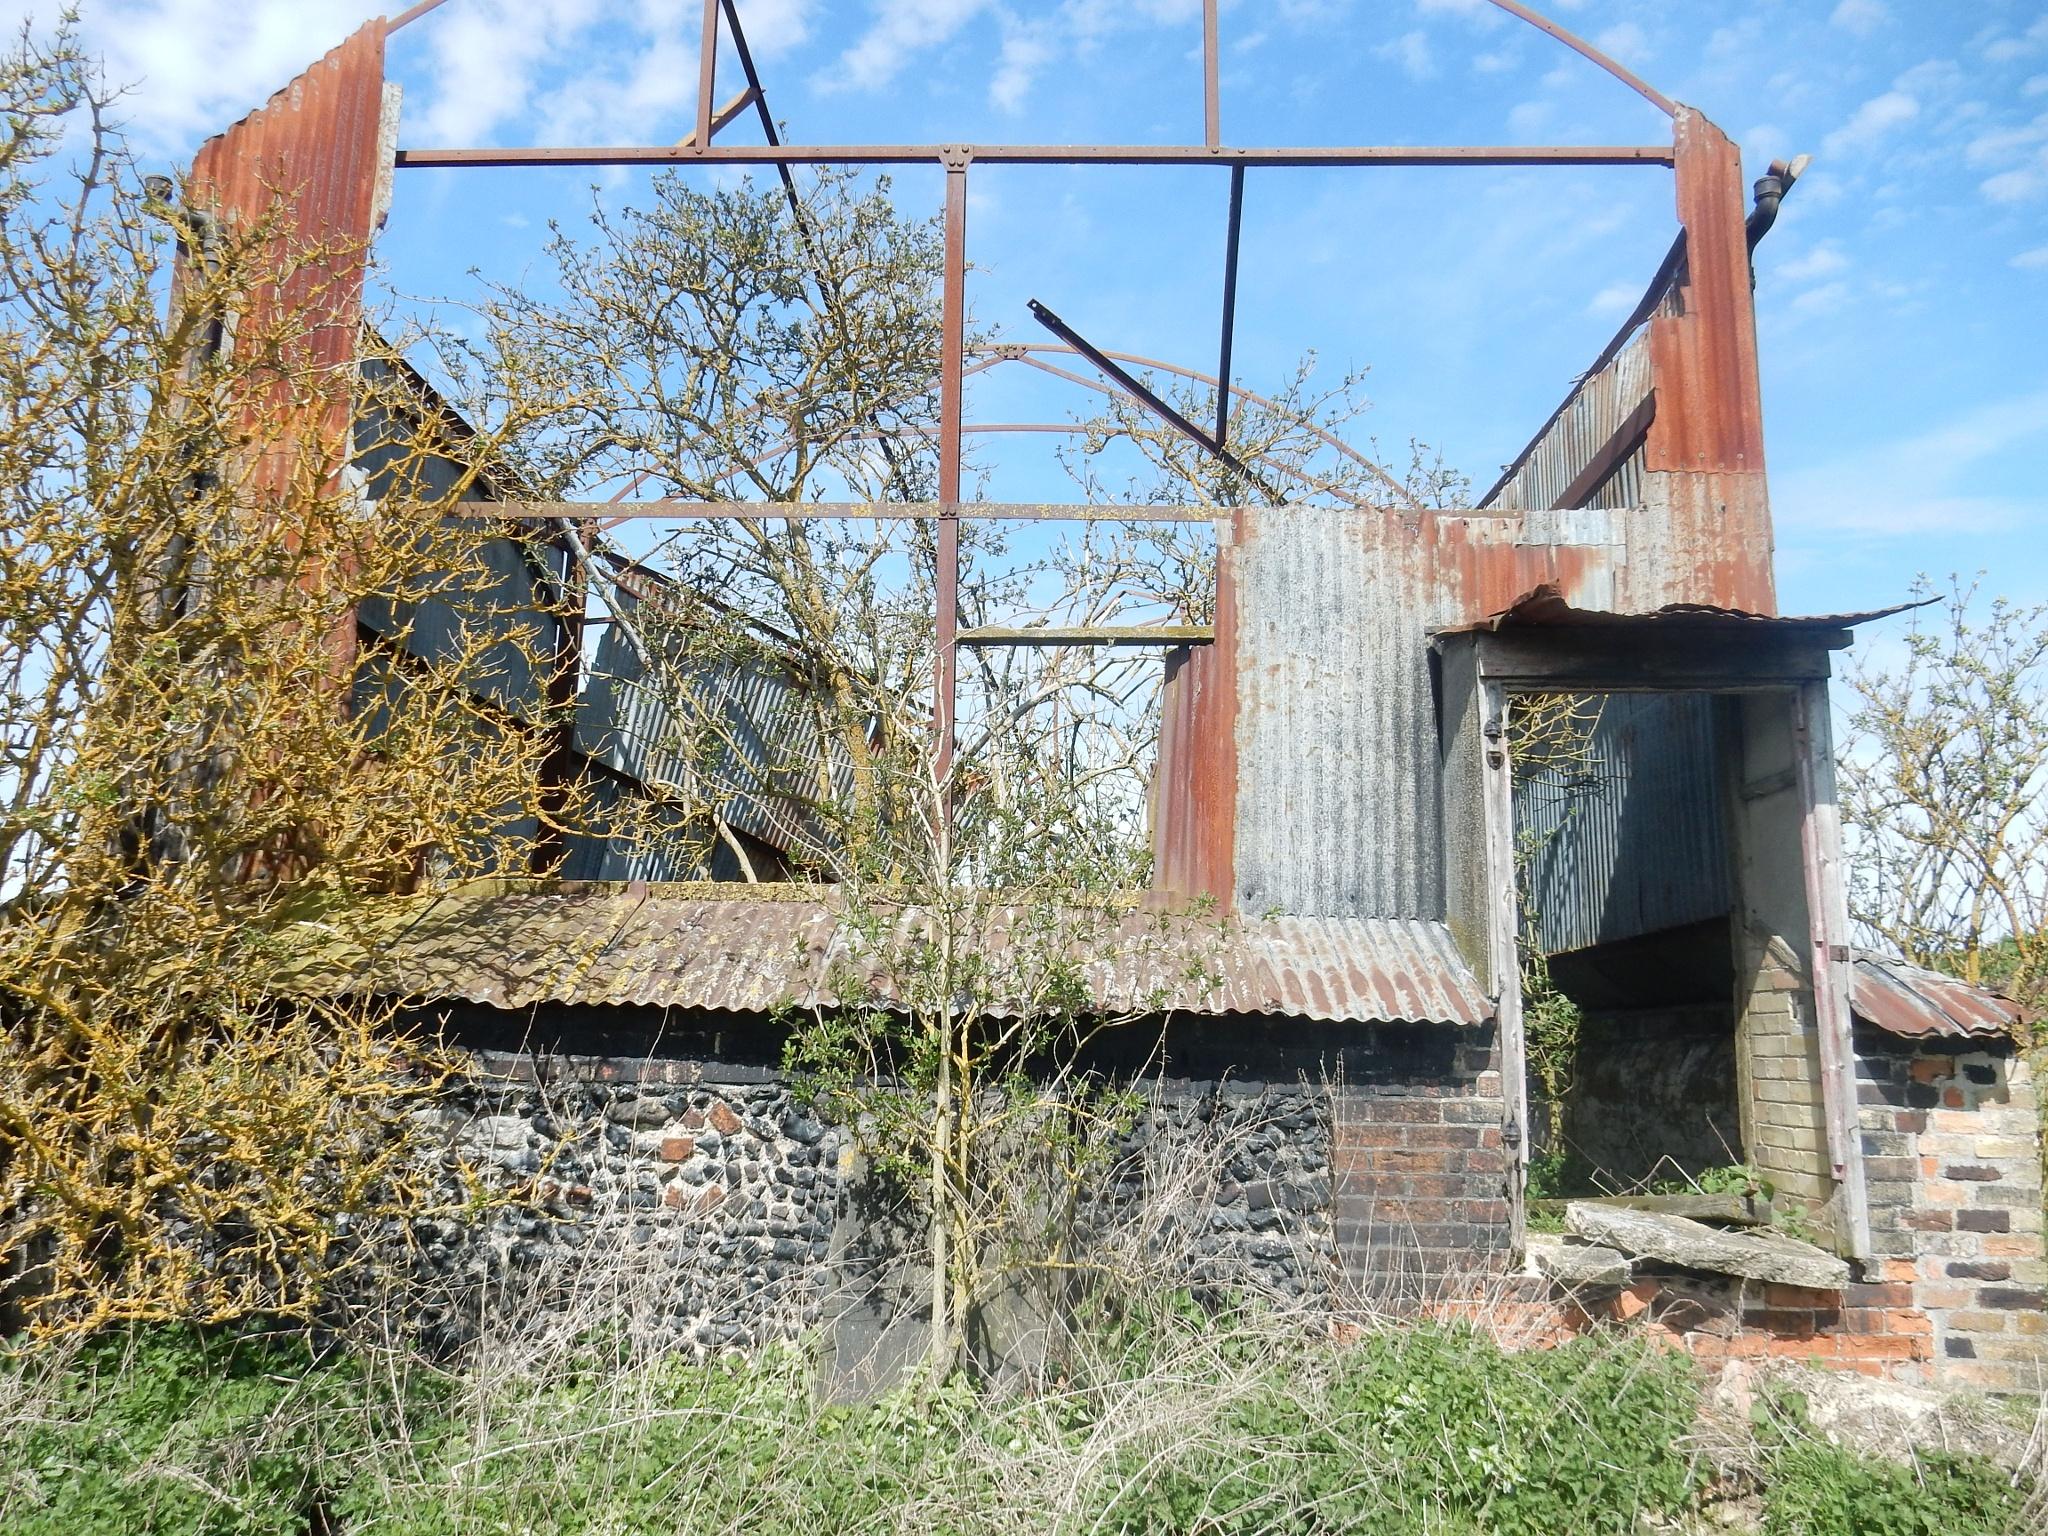 The Ruin by Simon Hill